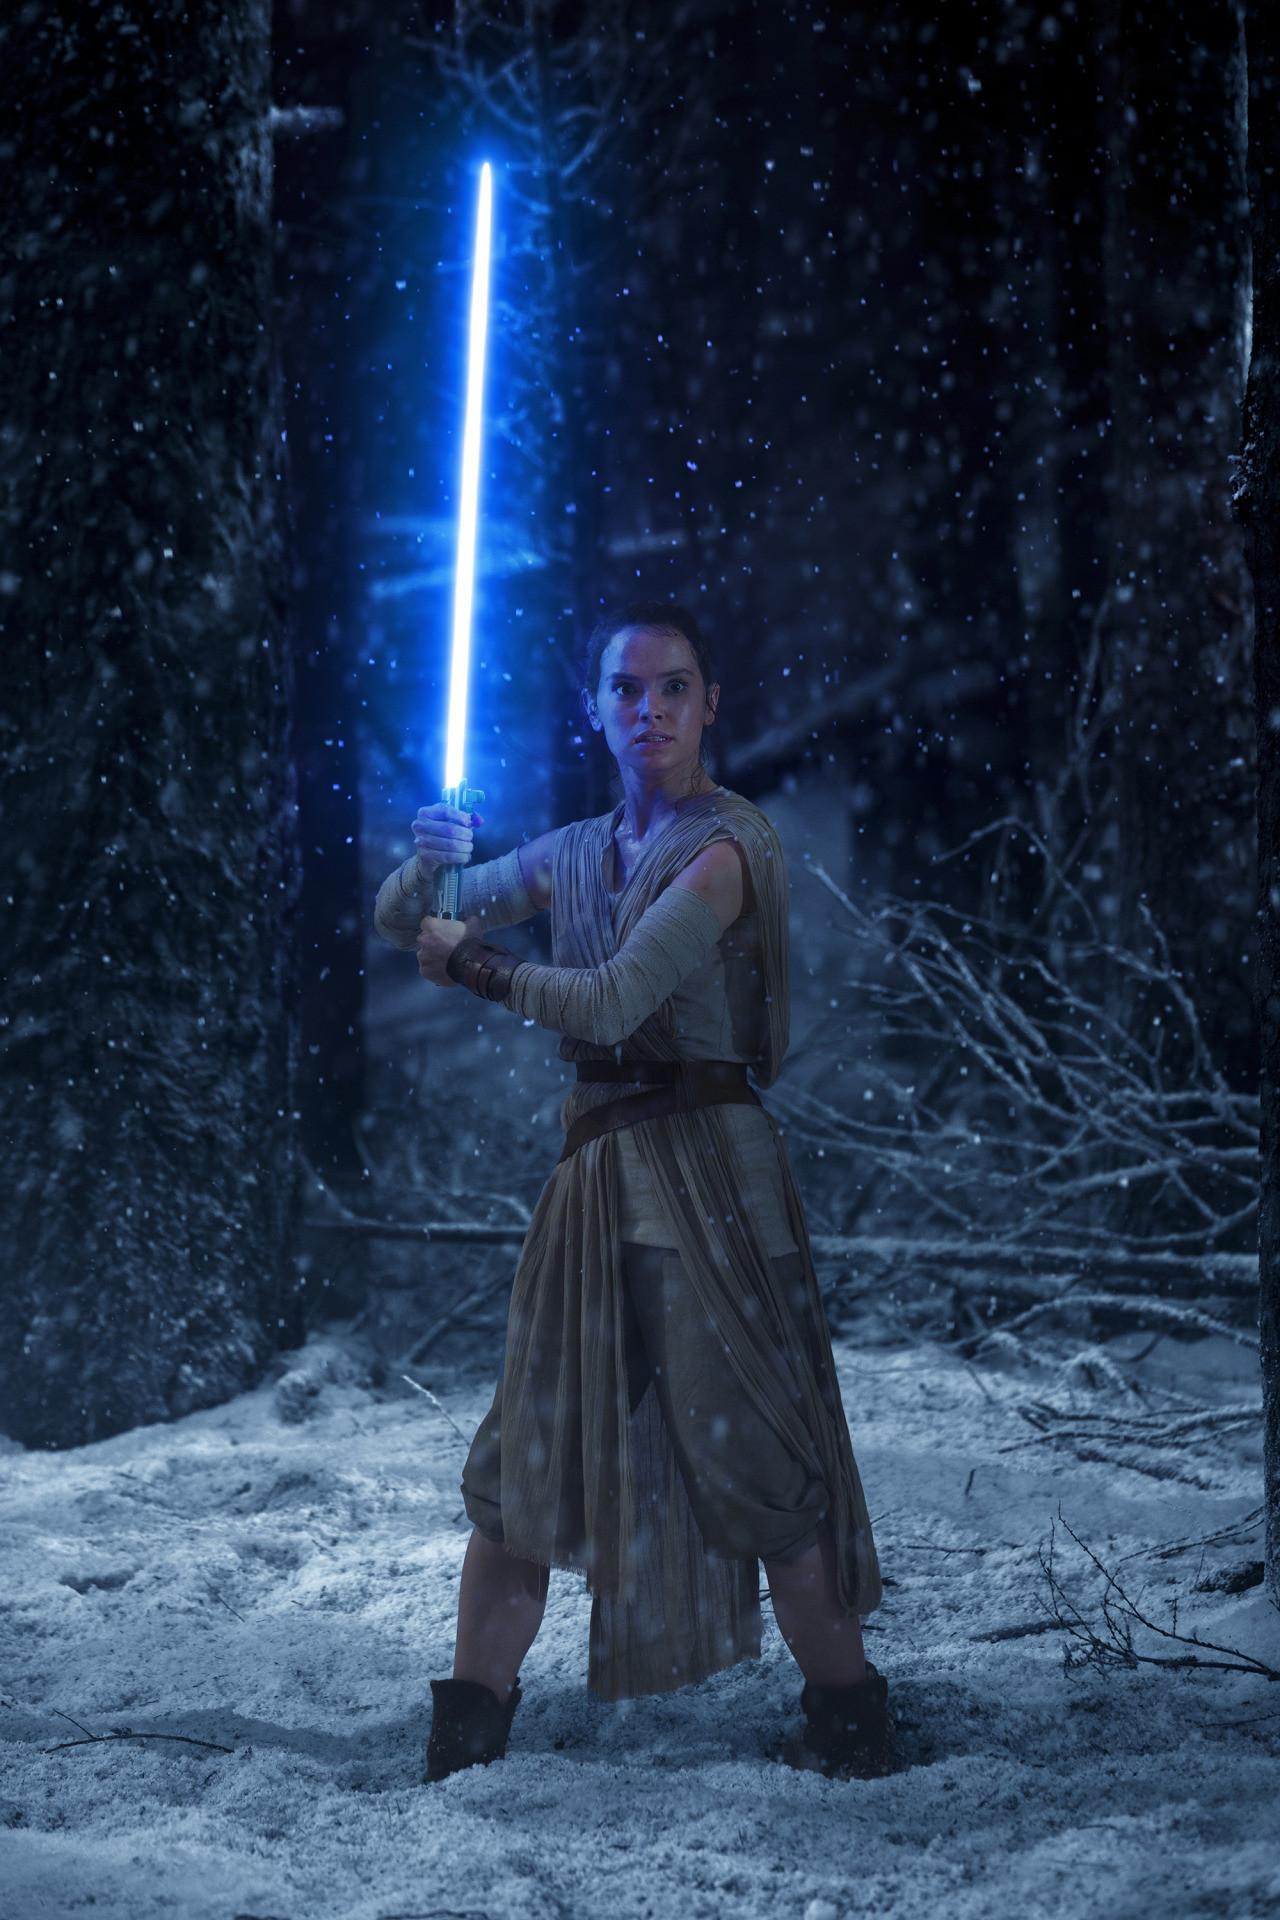 Star Wars Rey Wallpaper Iphone 2926899 Hd Wallpaper Backgrounds Download